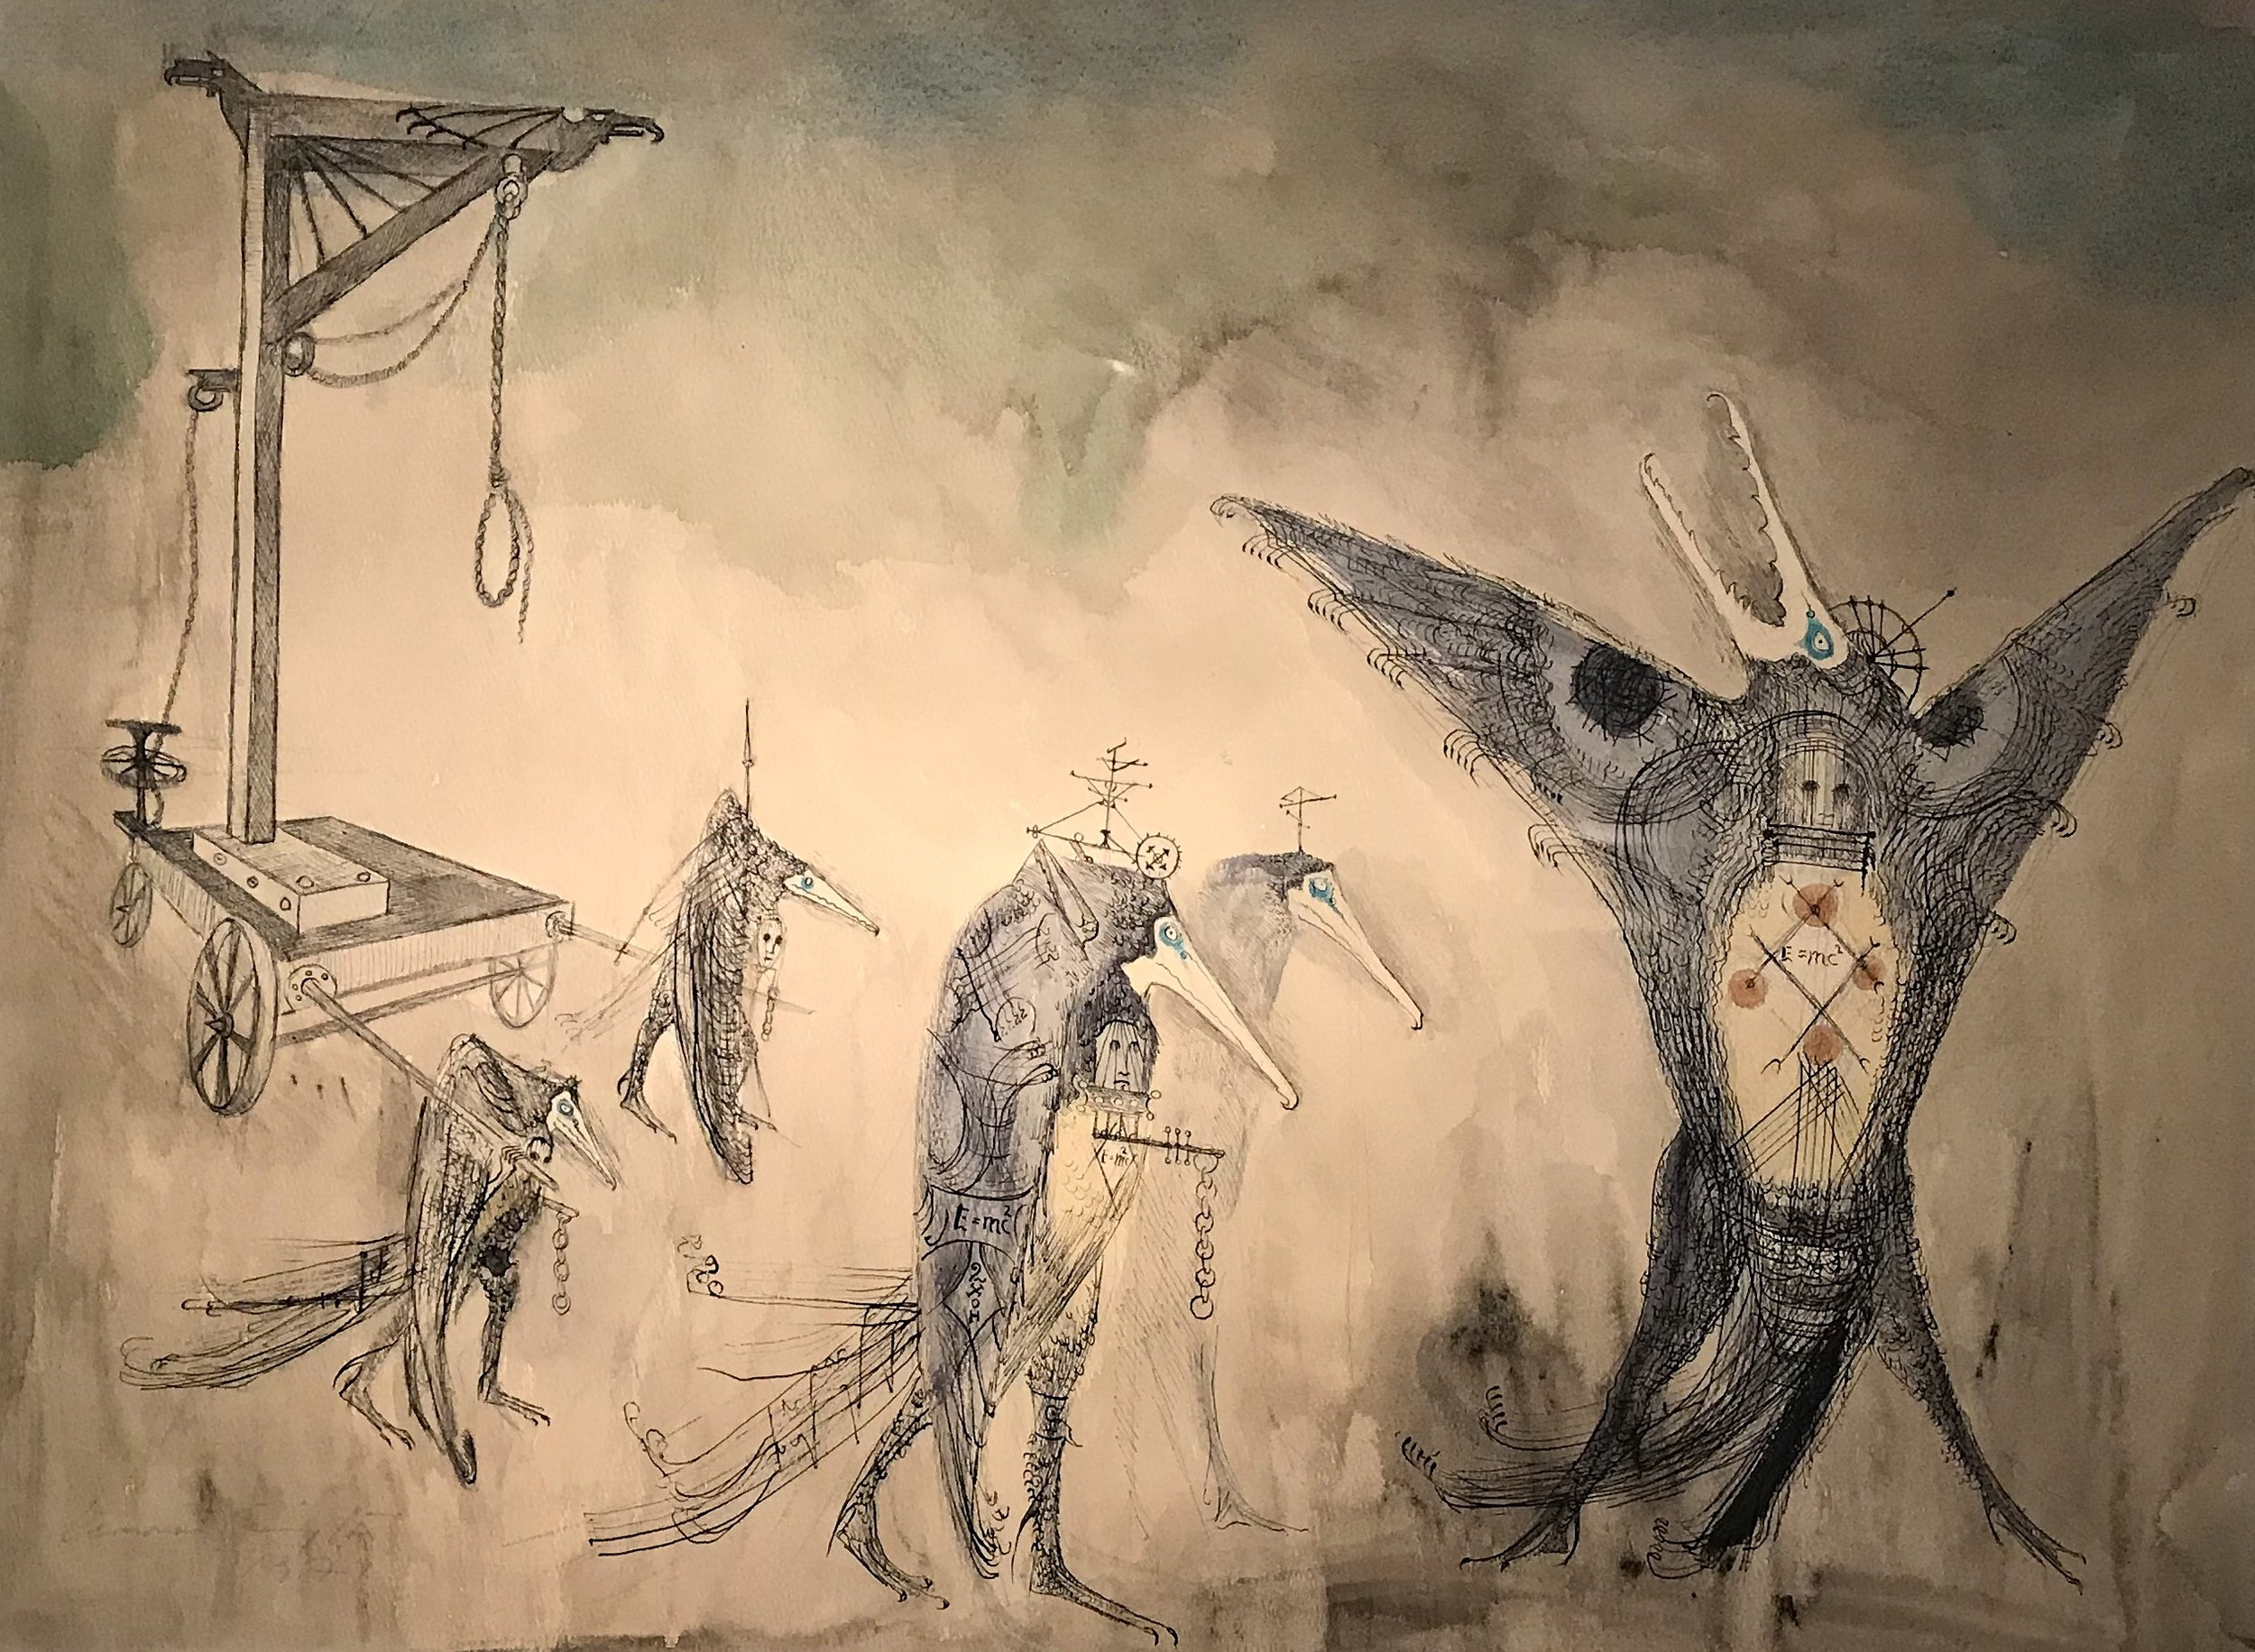 Aves de Horca (The Gibbet Birds) , 1971 watercolor on paper.